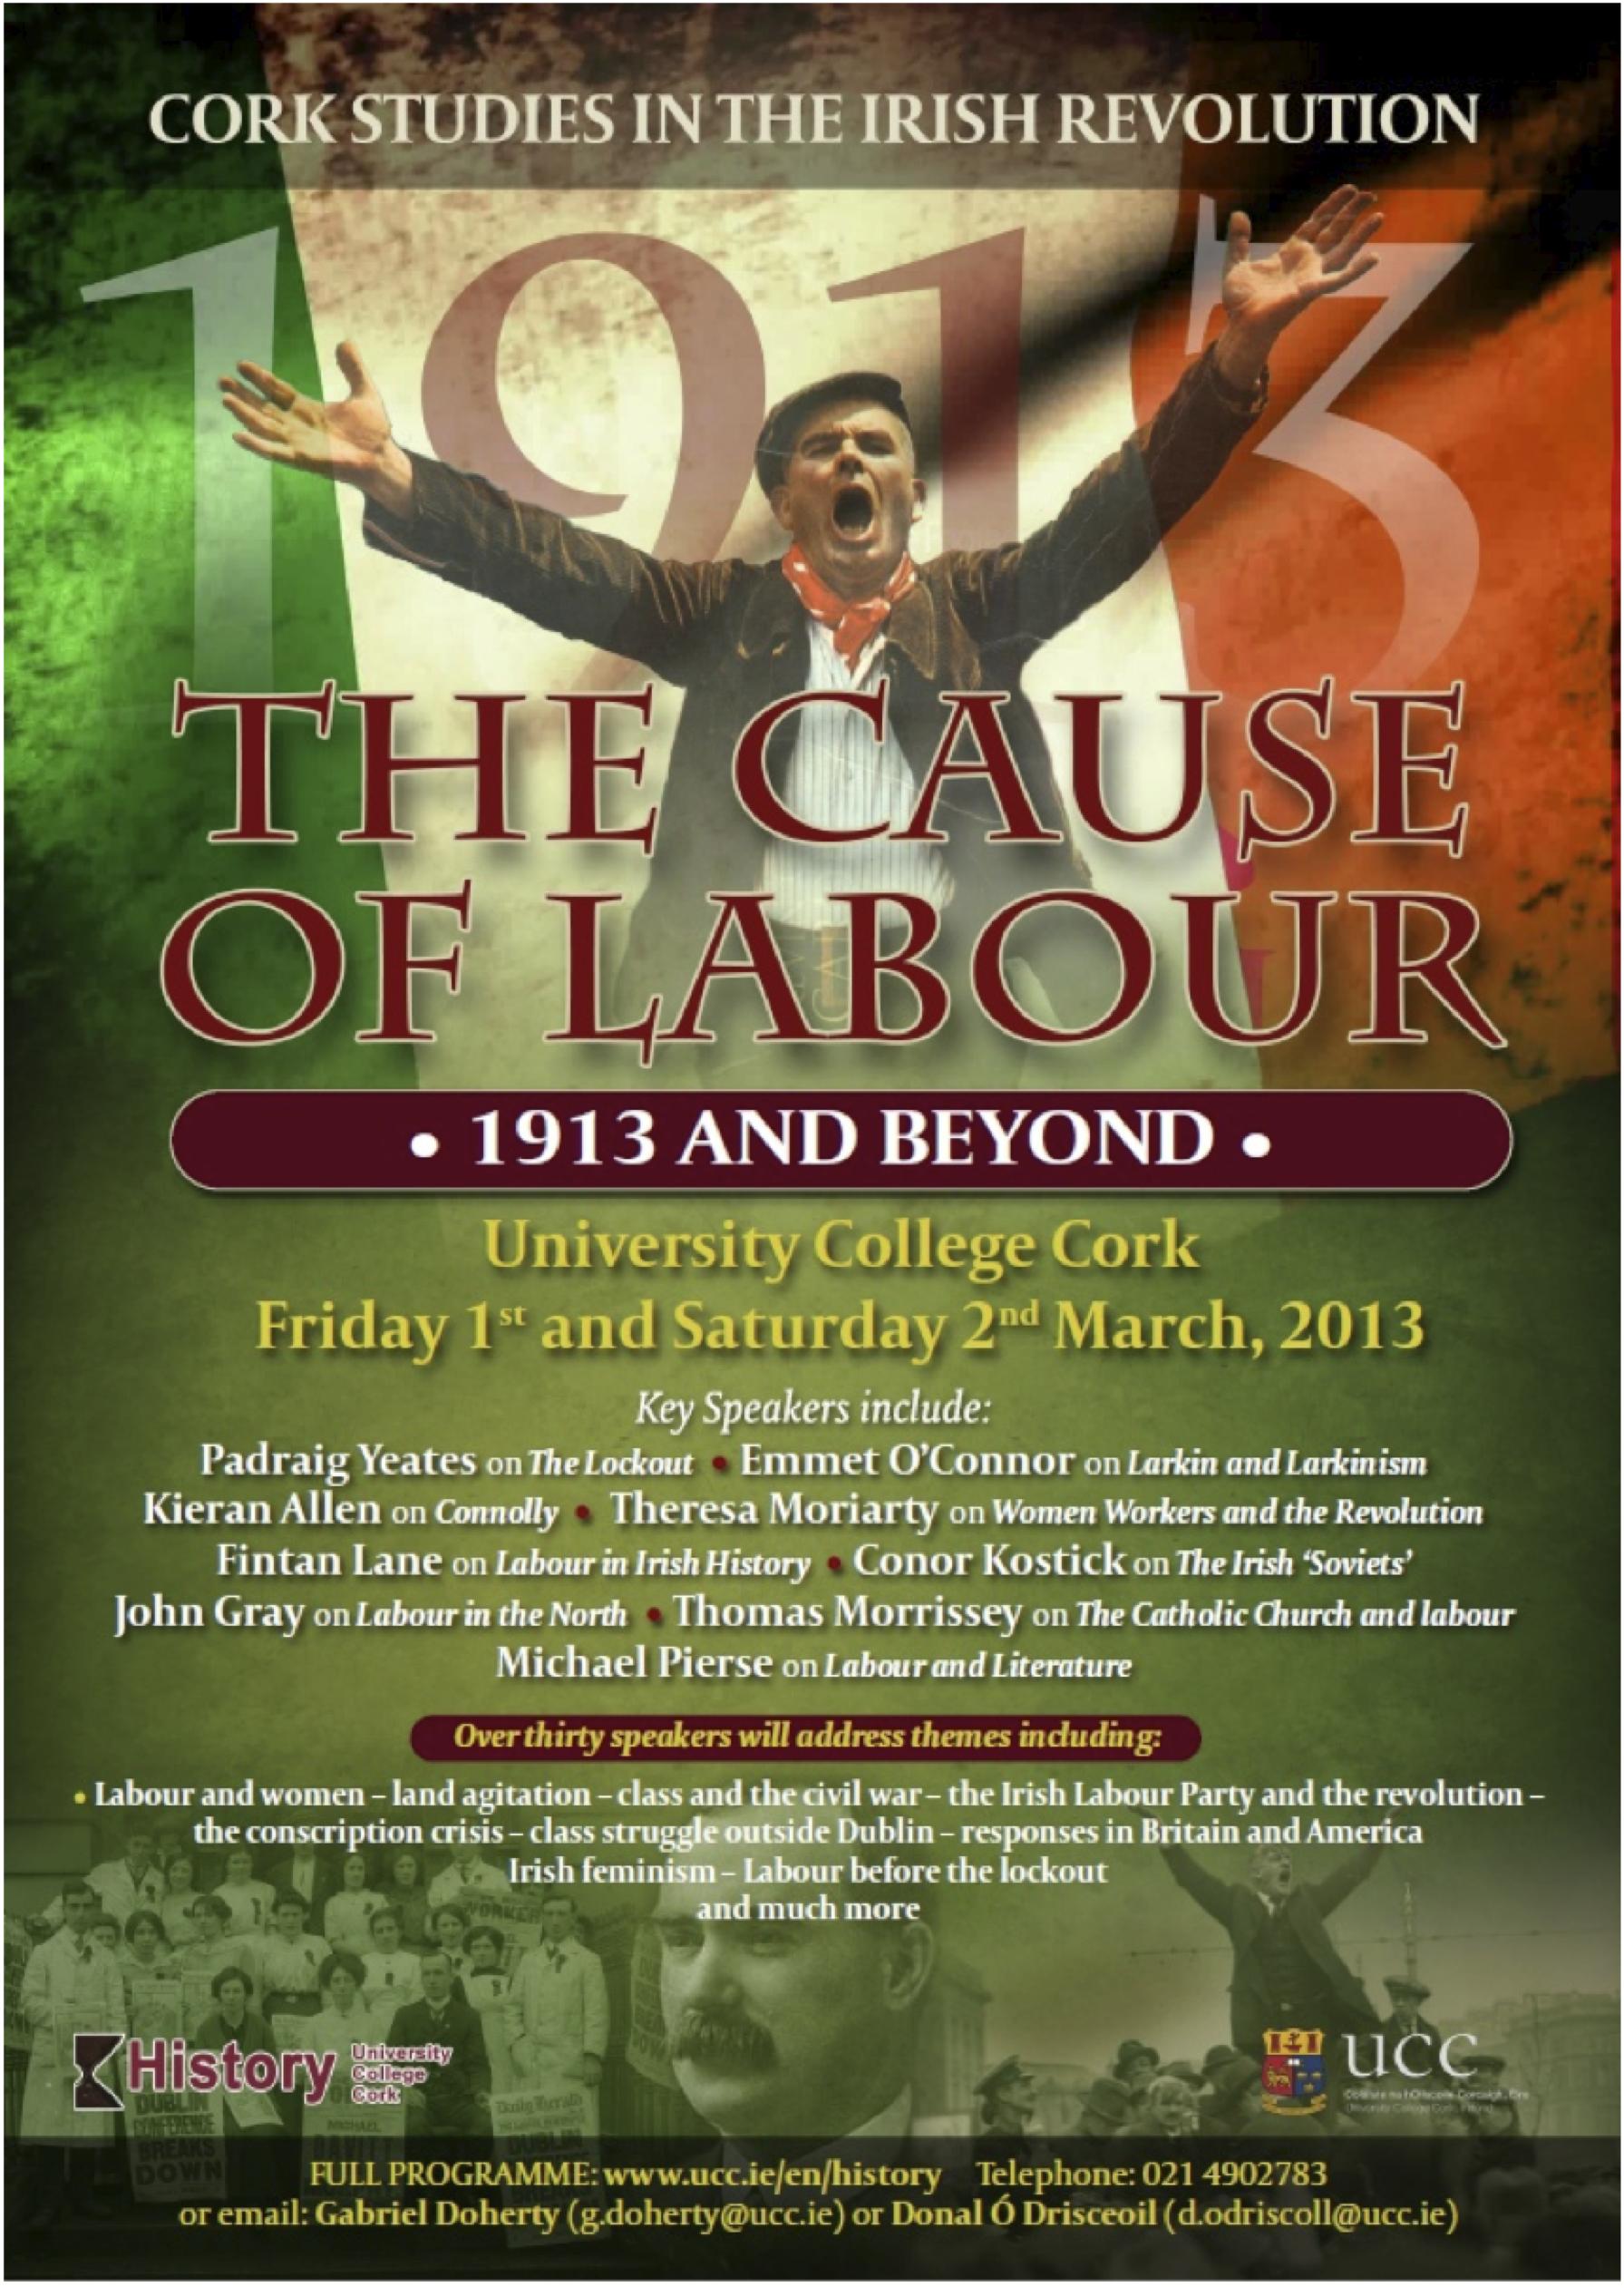 Saturday, 2 March 2013